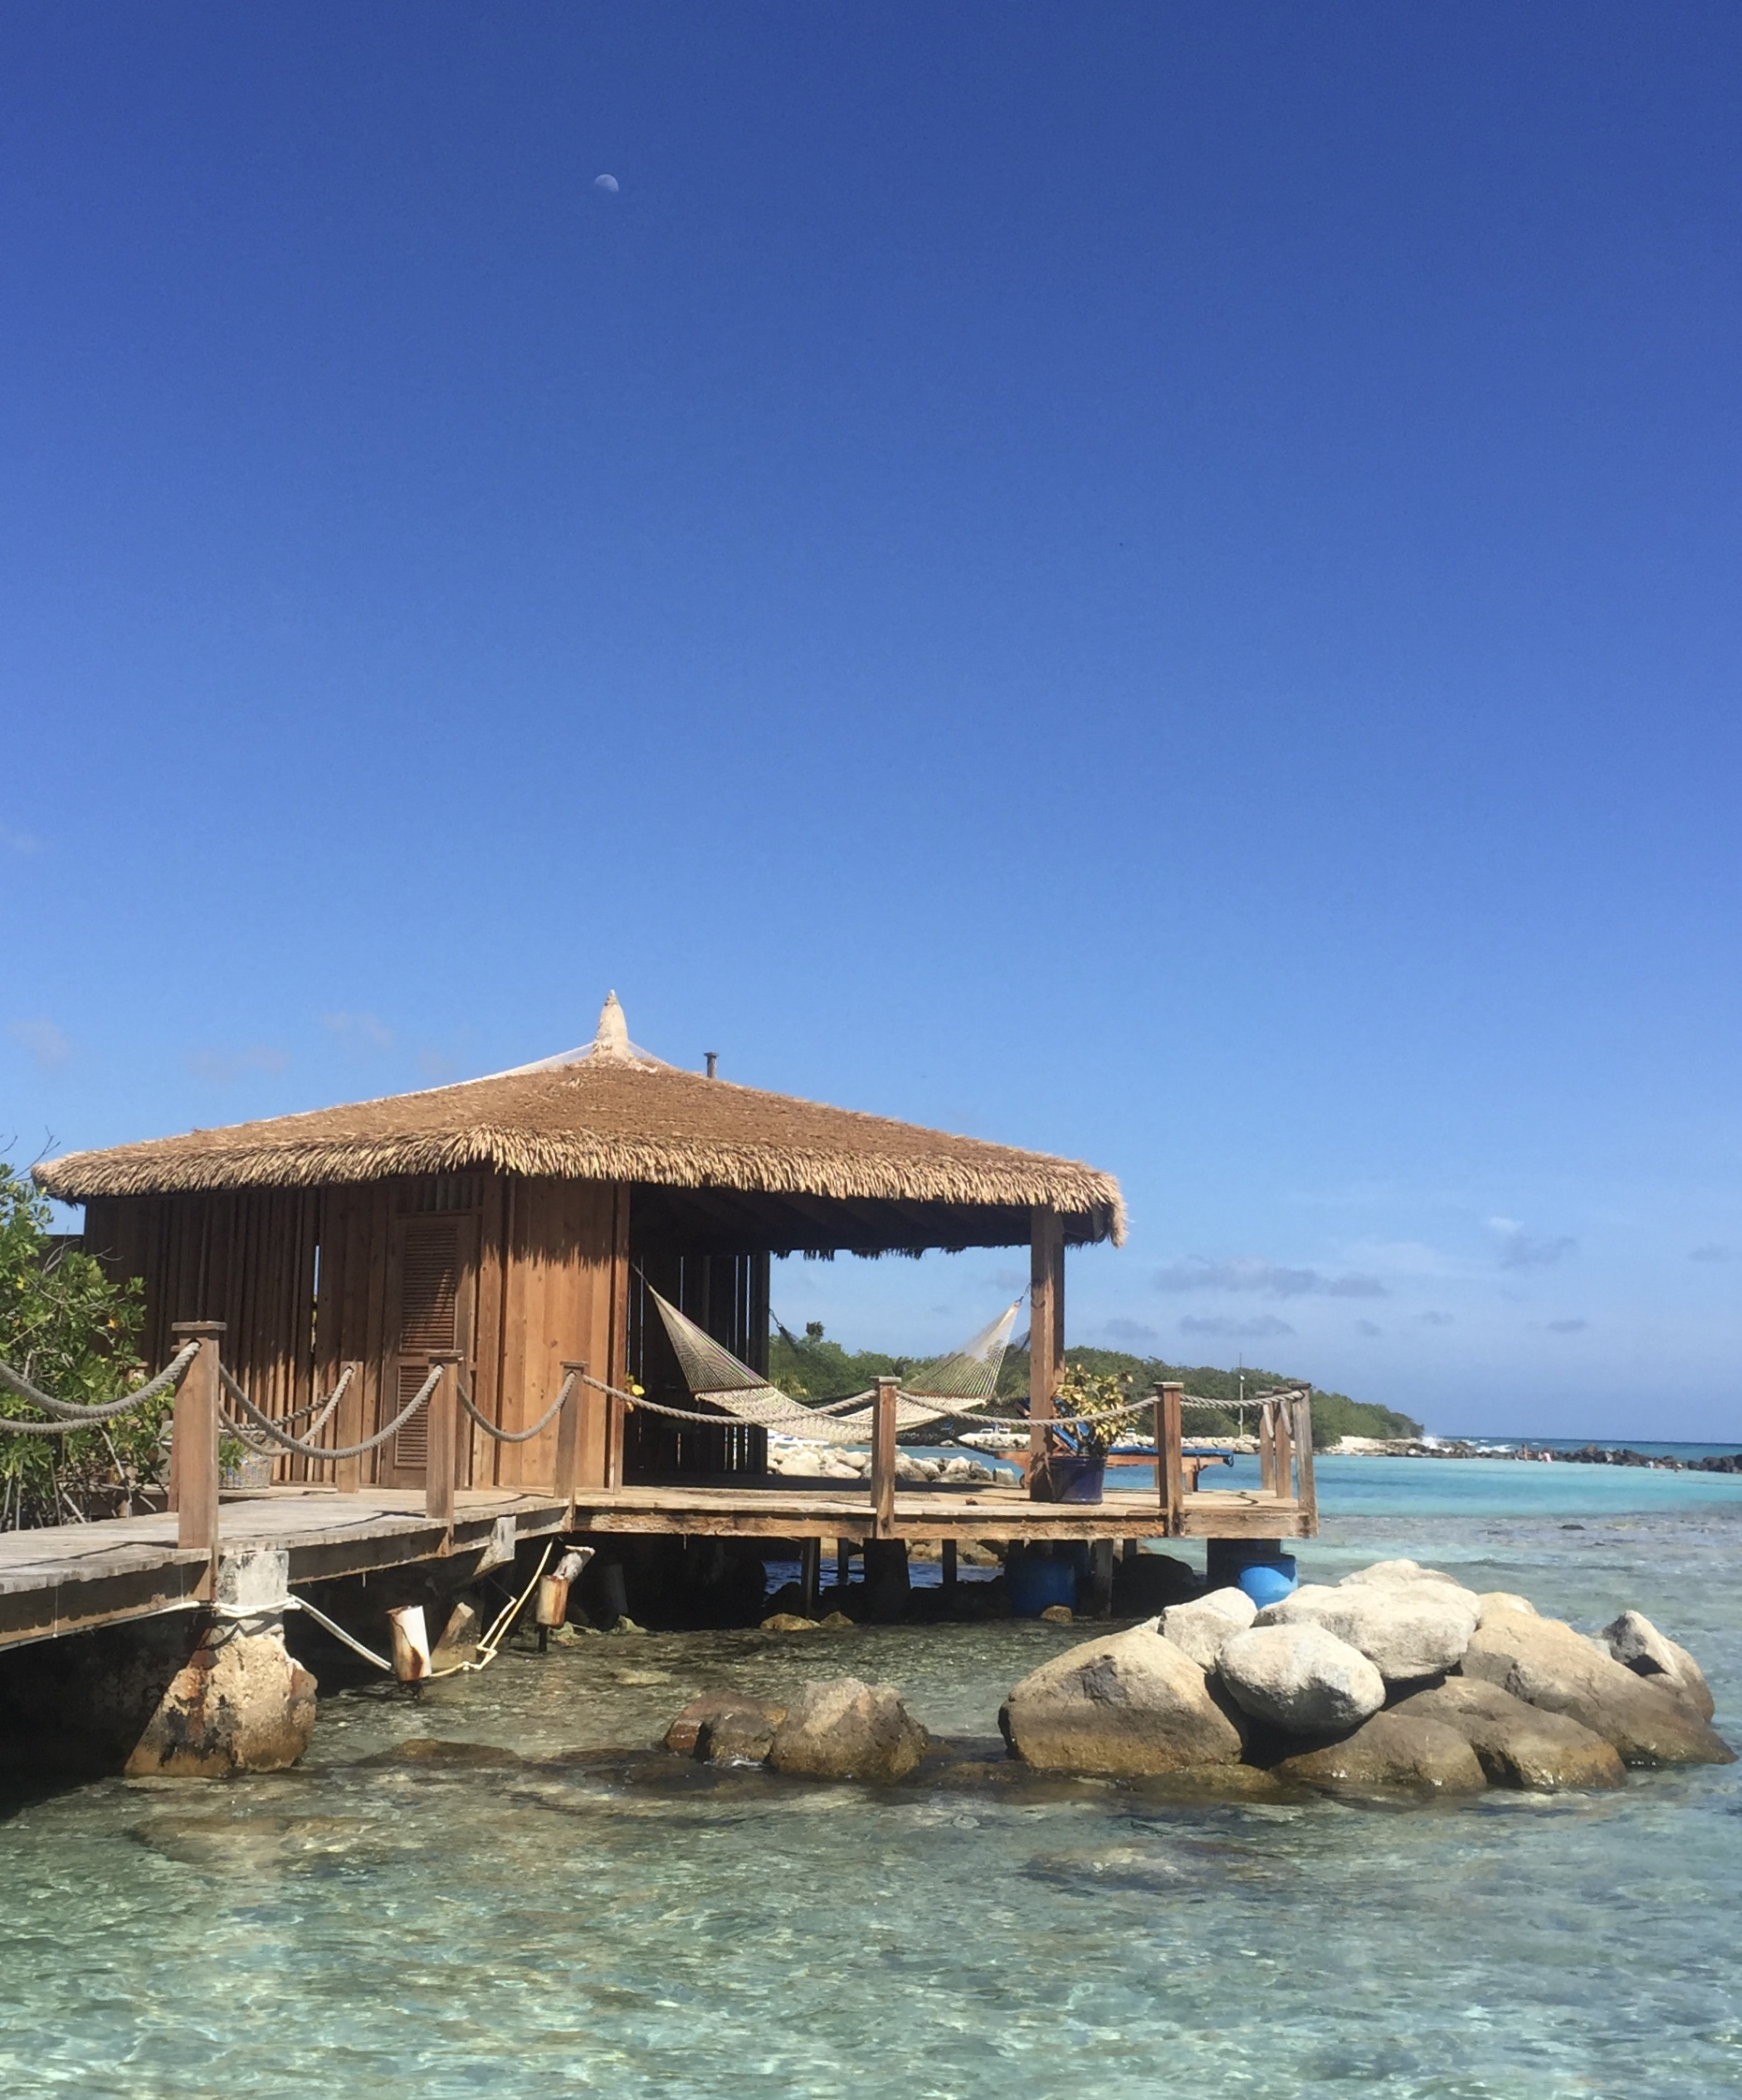 Renaissance Private Island